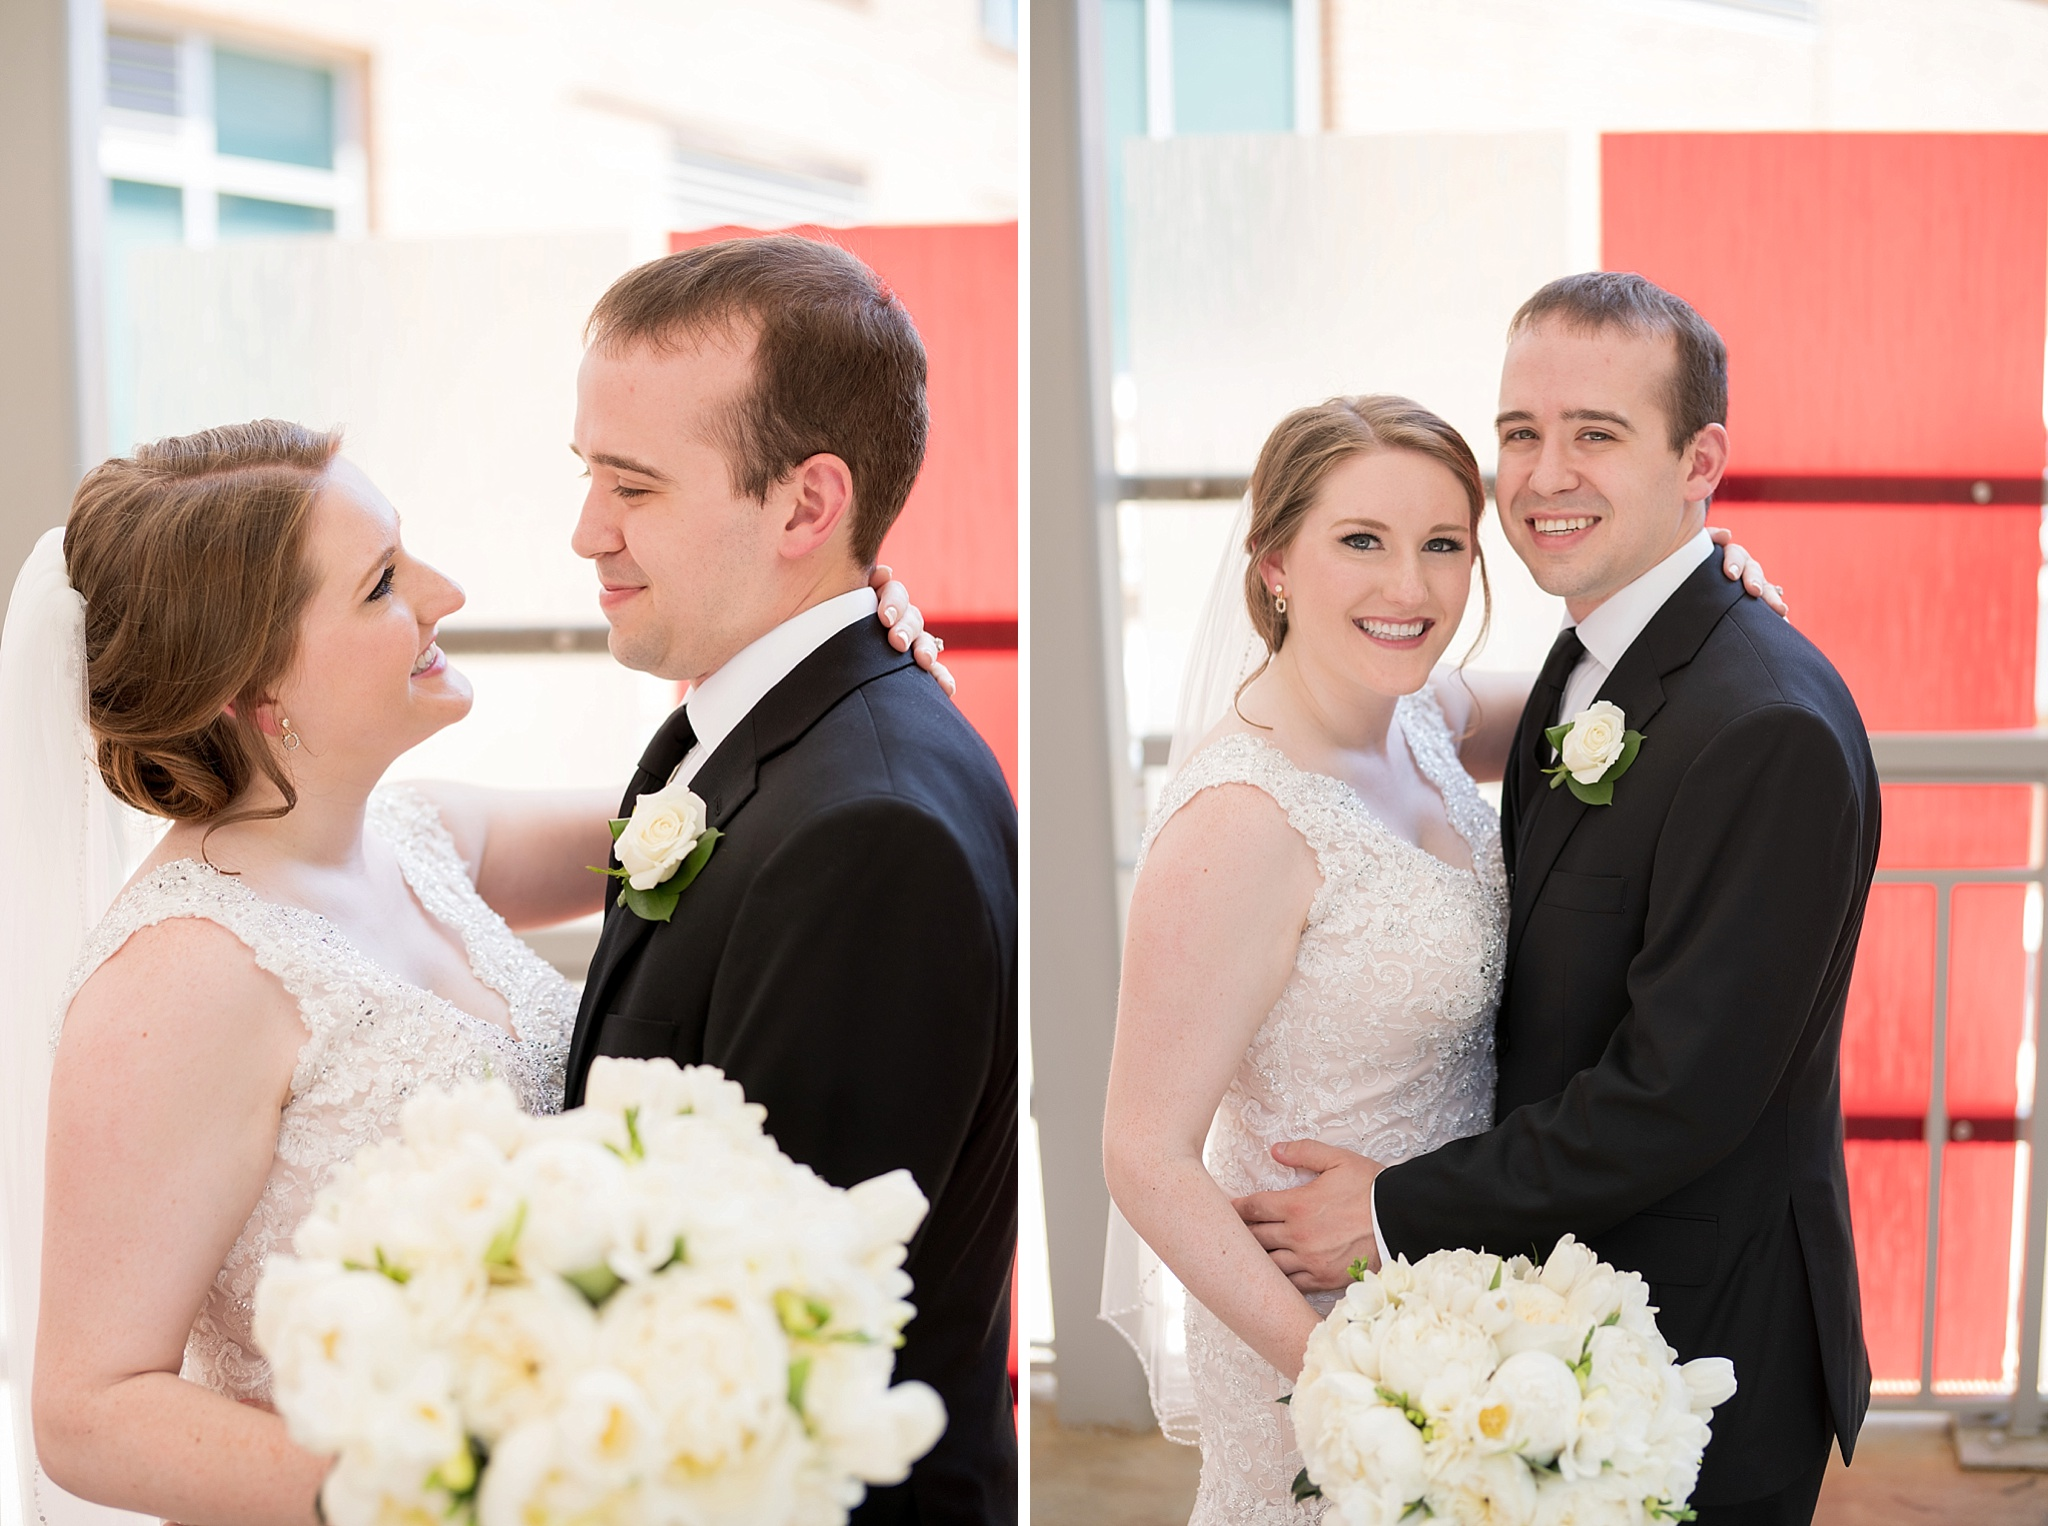 Pavilion-Carriage-Farms-Wedding-Photographer-182.jpg